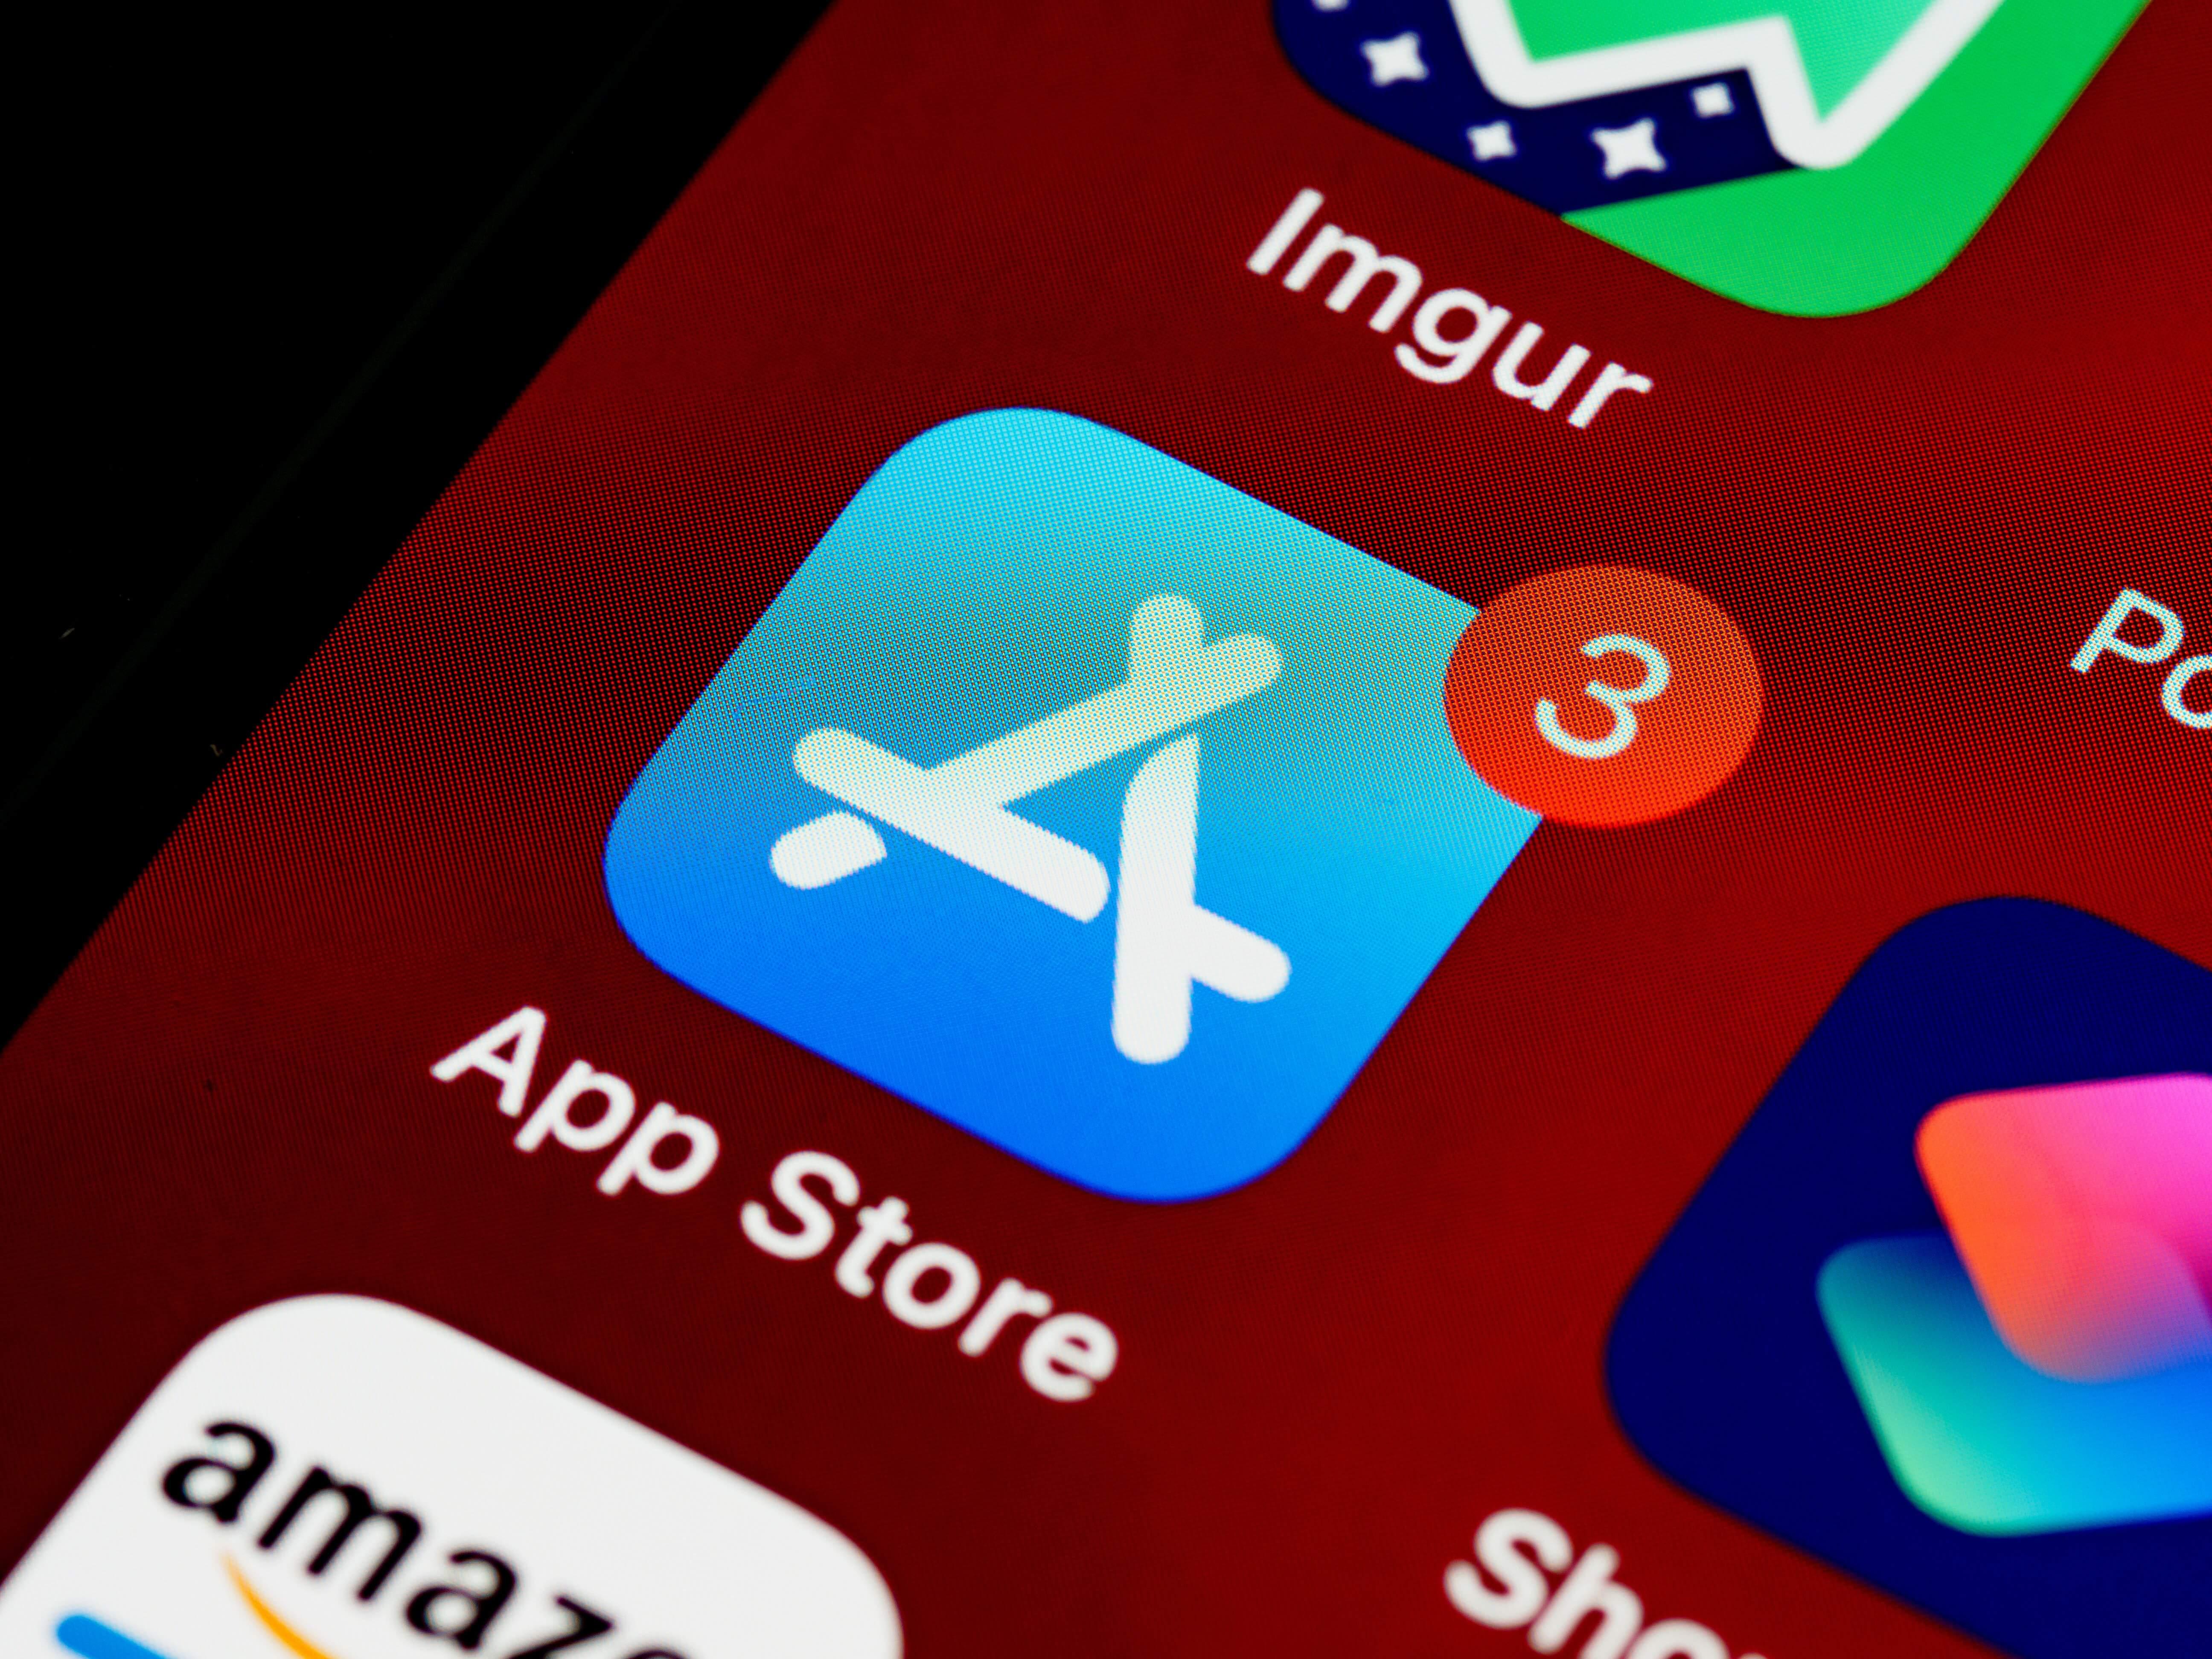 friends apps to meet up